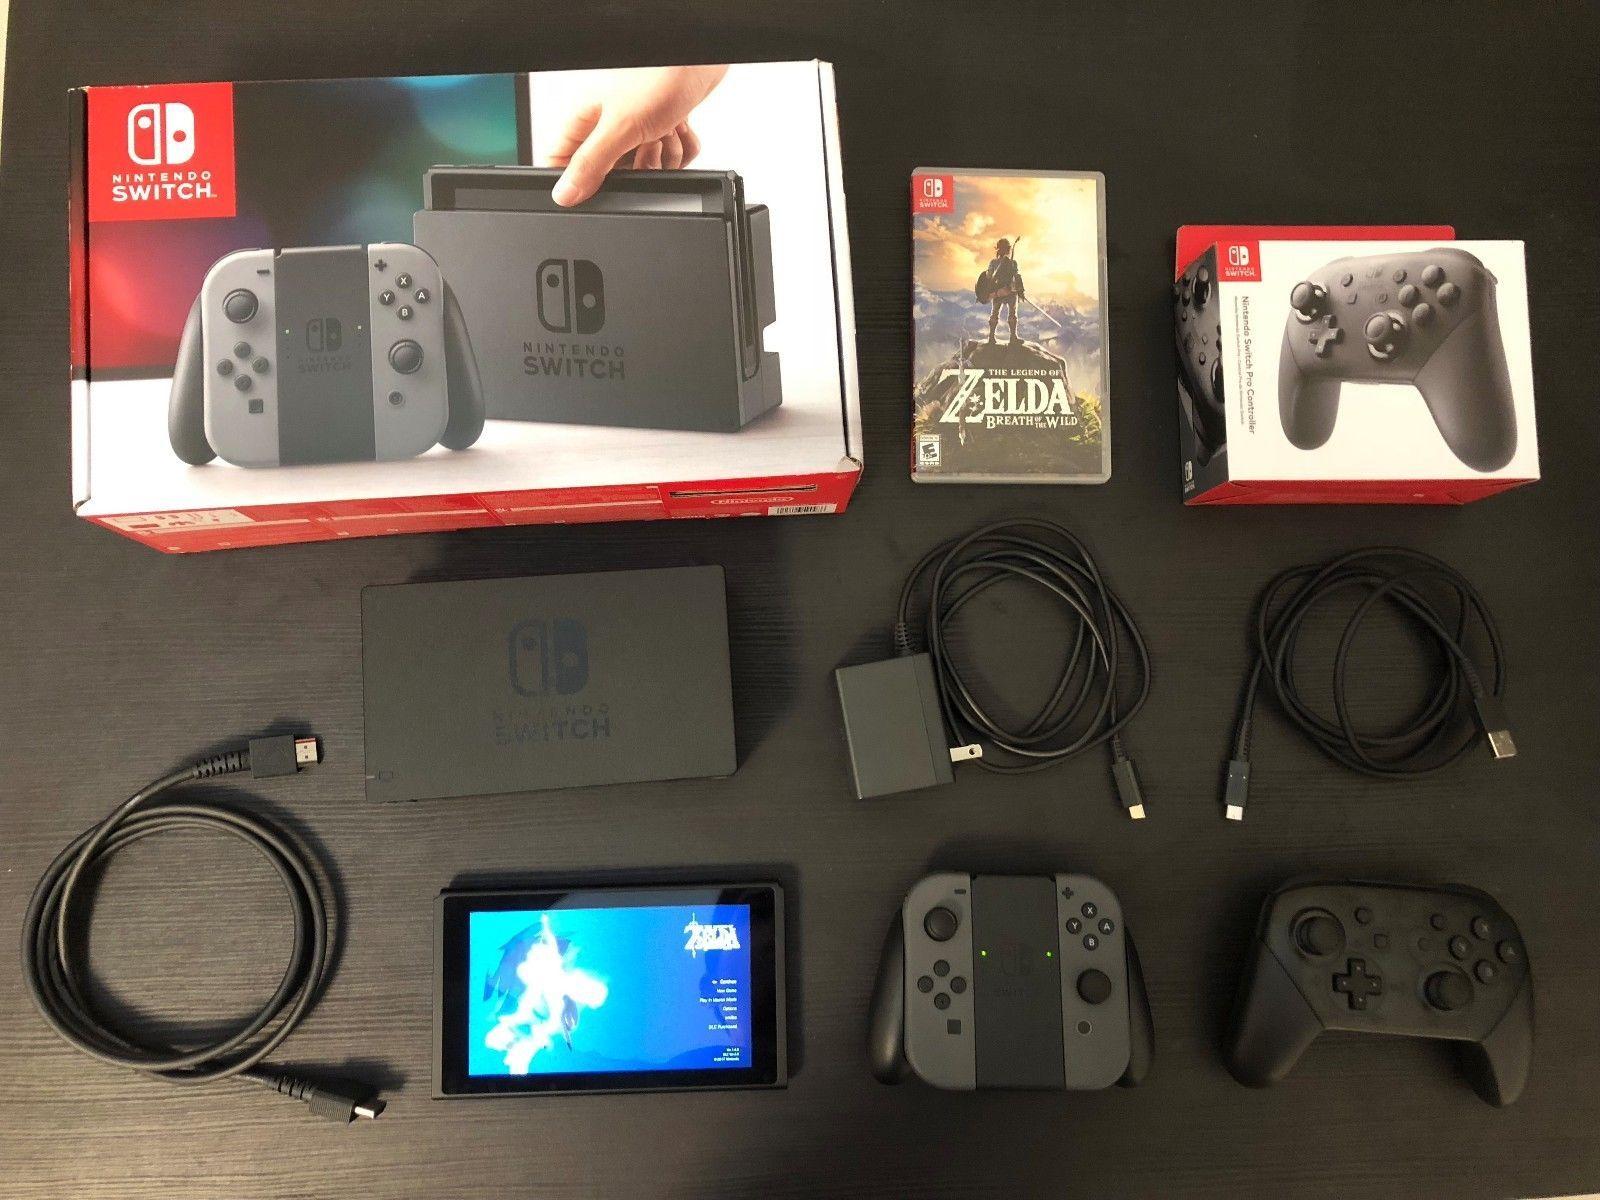 Nintendo Switch 32gb Gray Console With Grey Joy Con Controllers Bundle